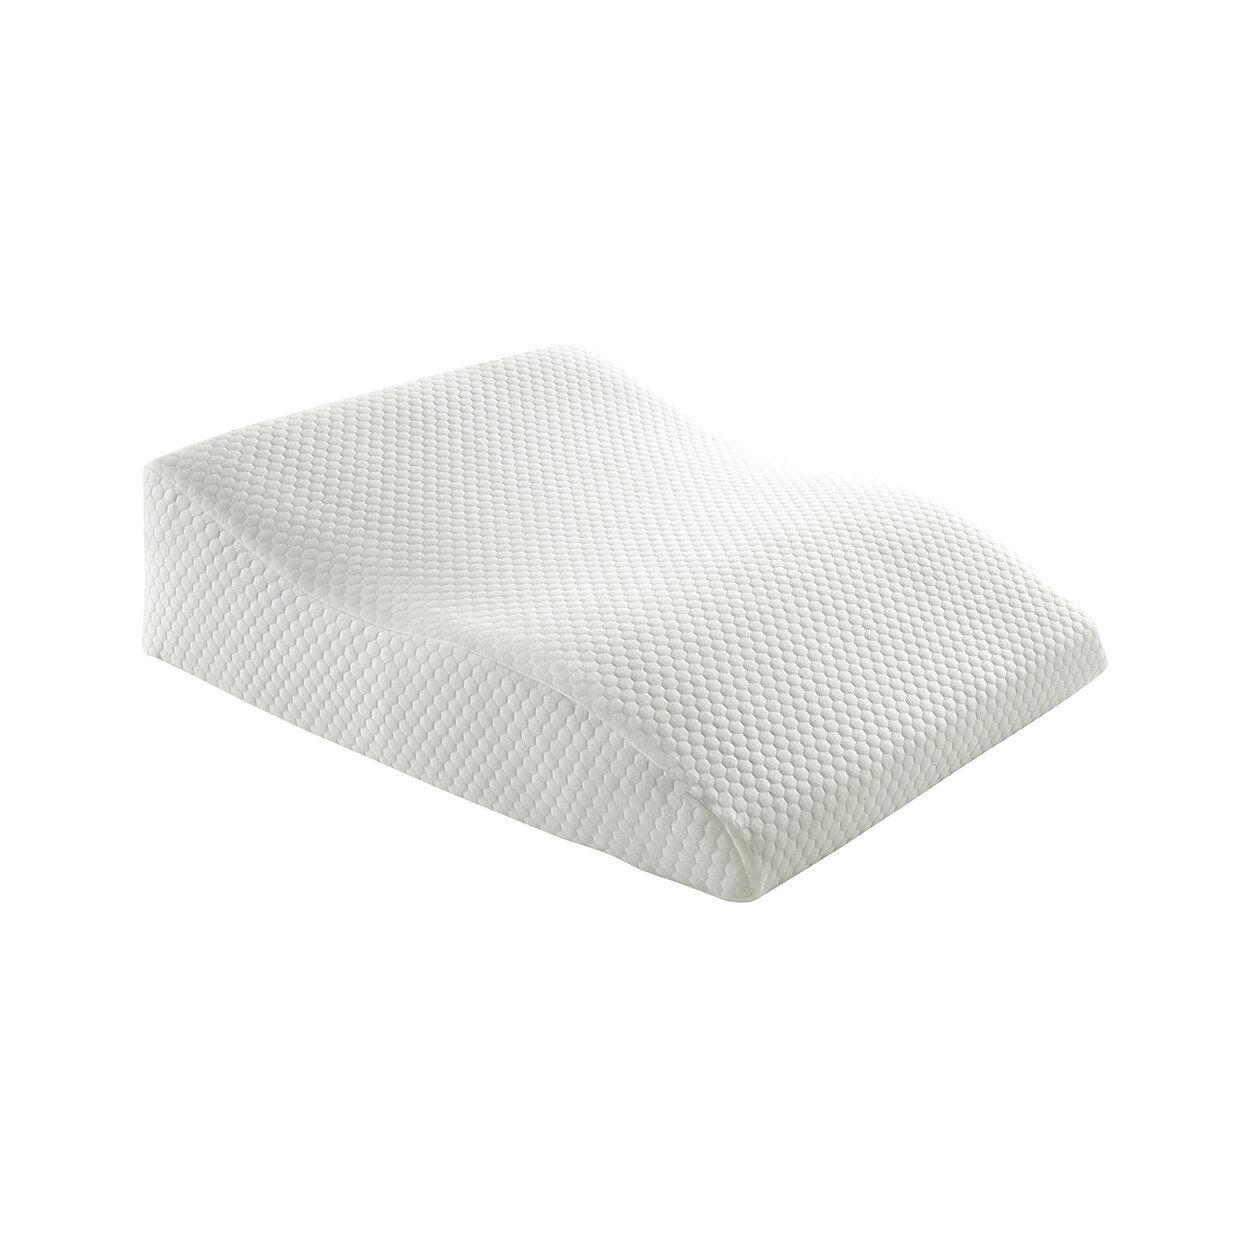 cuscini ortopedici cuscino sollevagambe